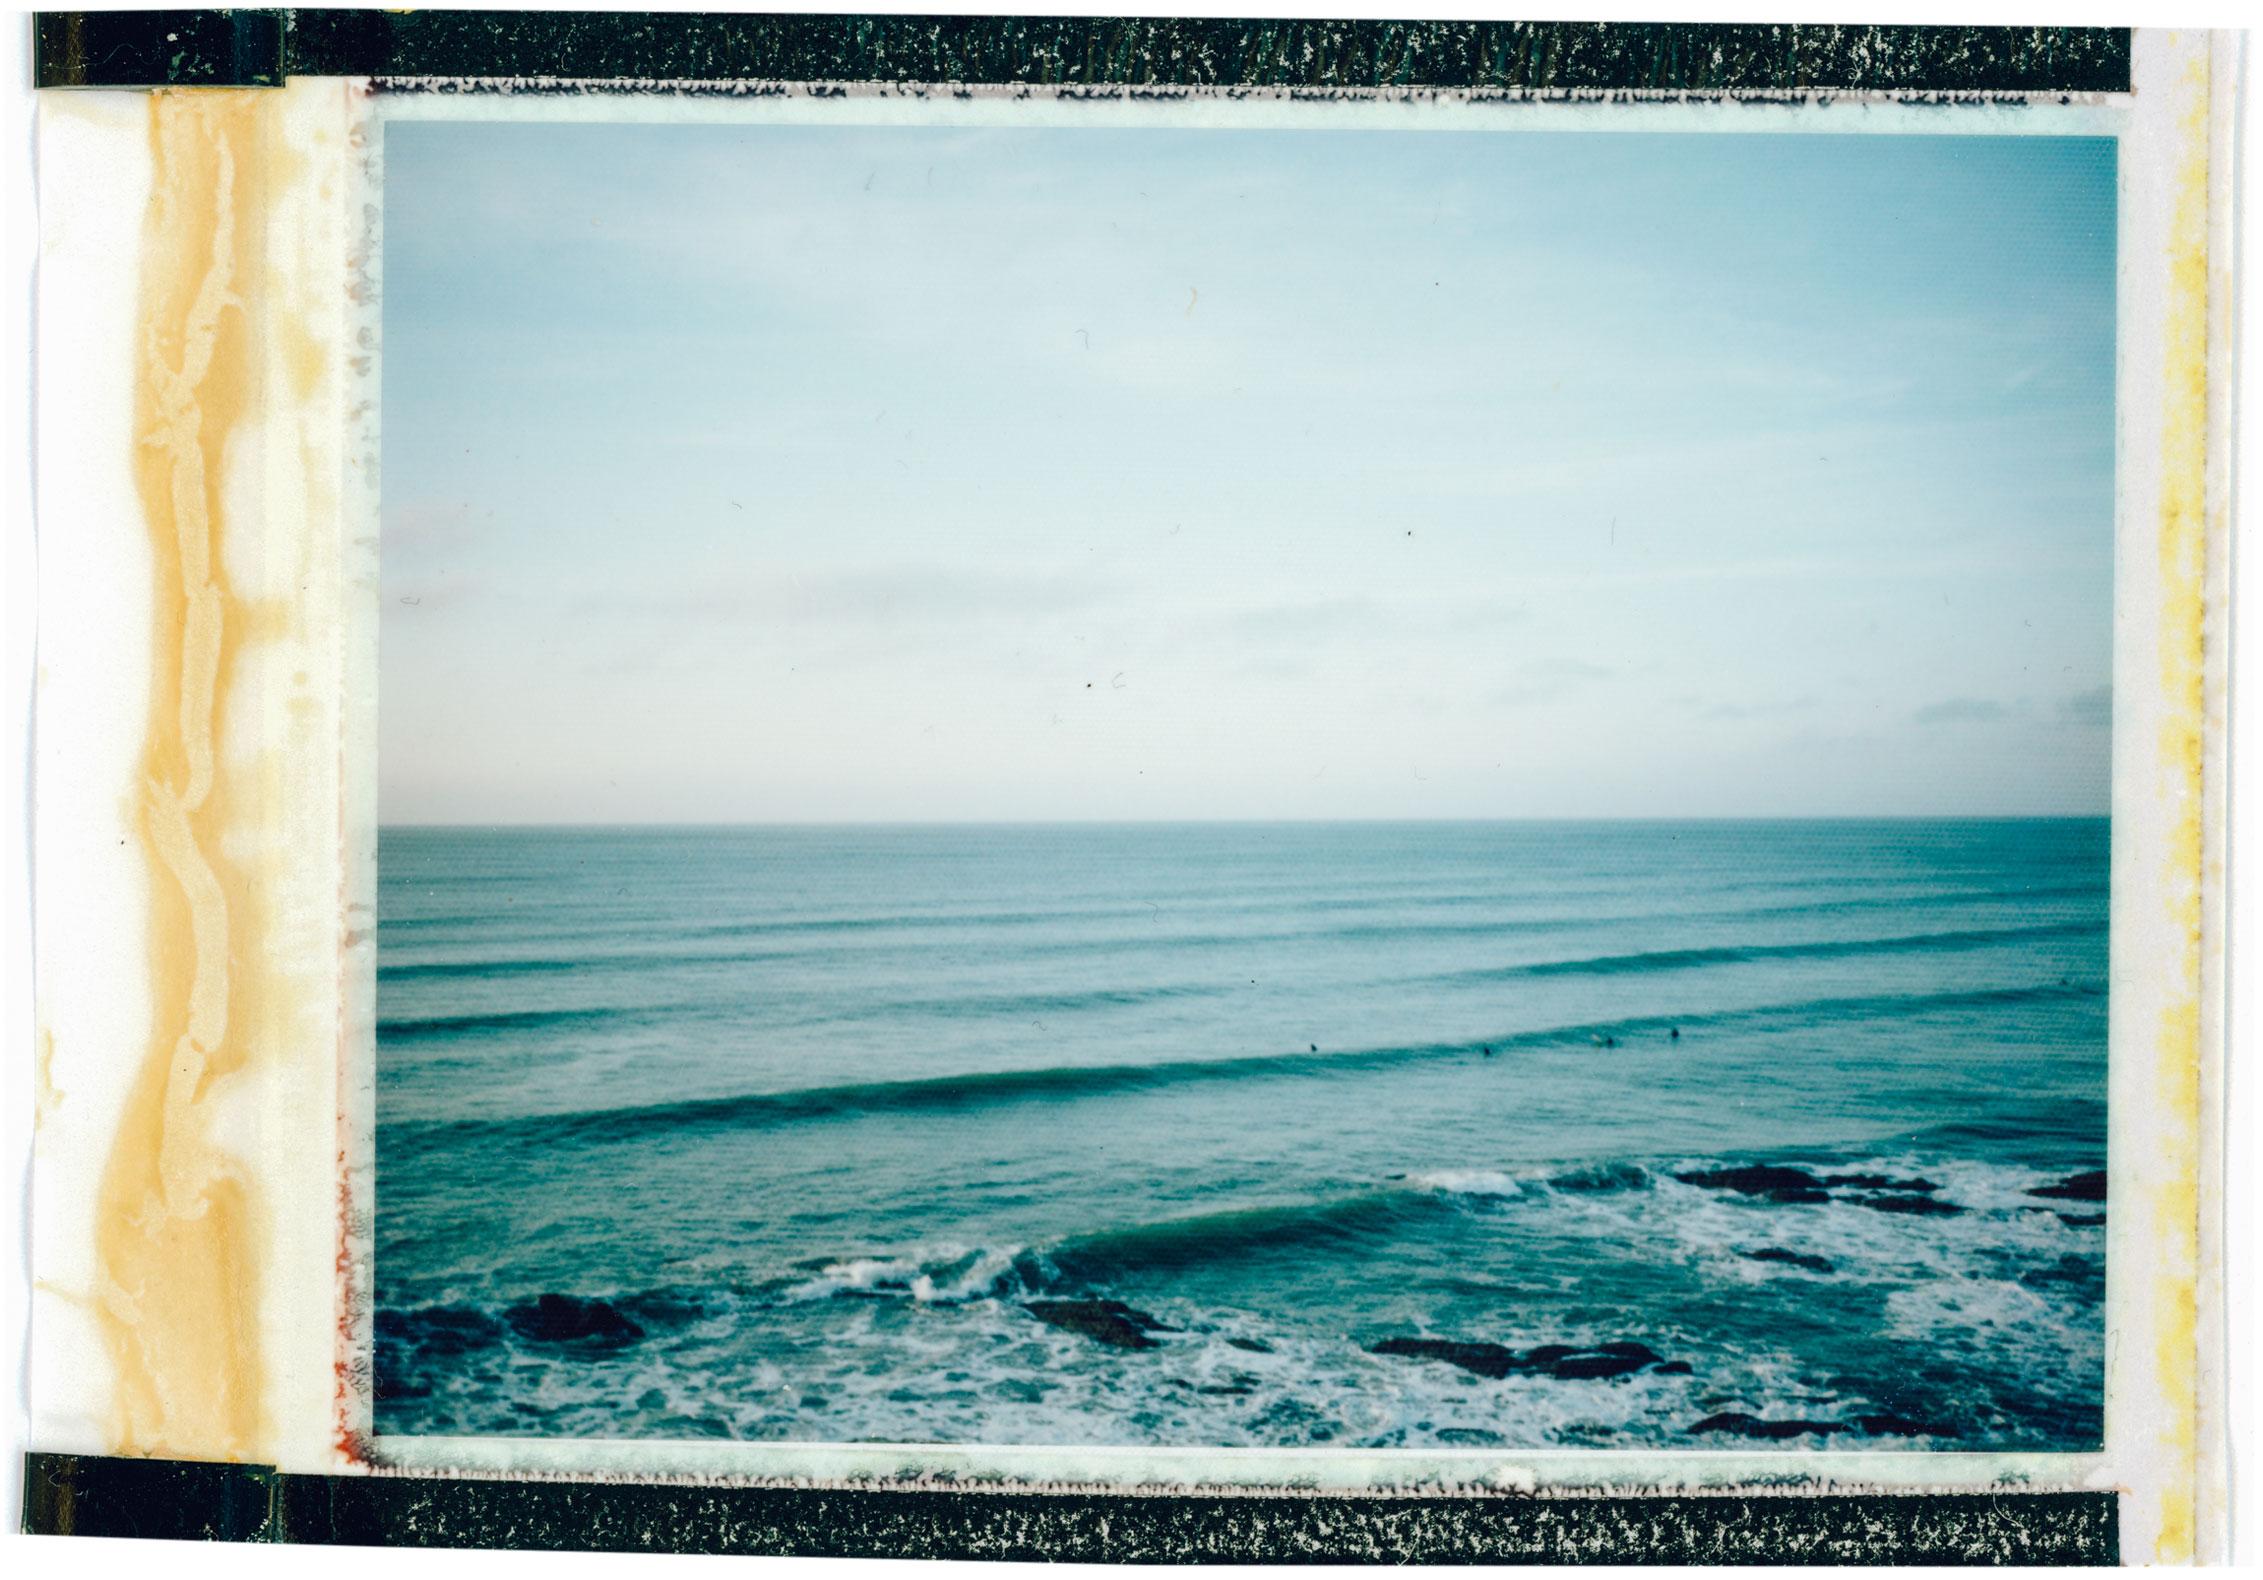 Waiting+for+waves+at+Fistral+Beach+_+Karl+Mackie+Photography.jpeg